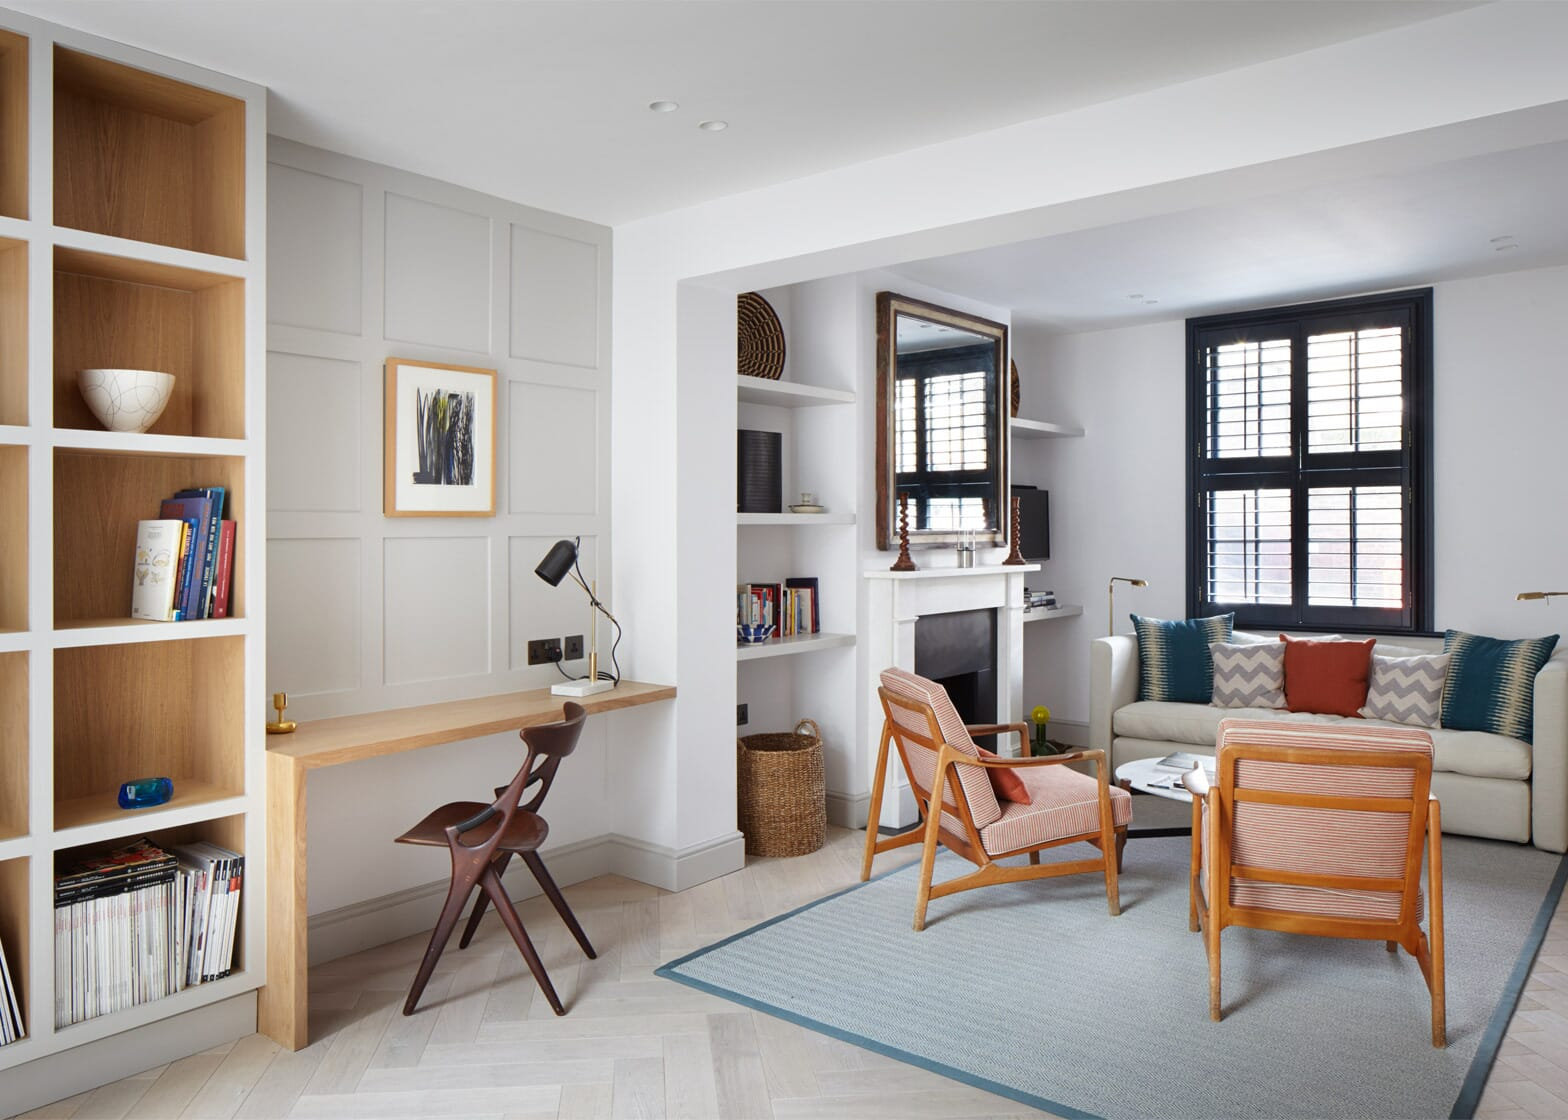 lambeth-marsh-house-fraher-architects-residential-renovation-london-uk_dezeen_1568_1